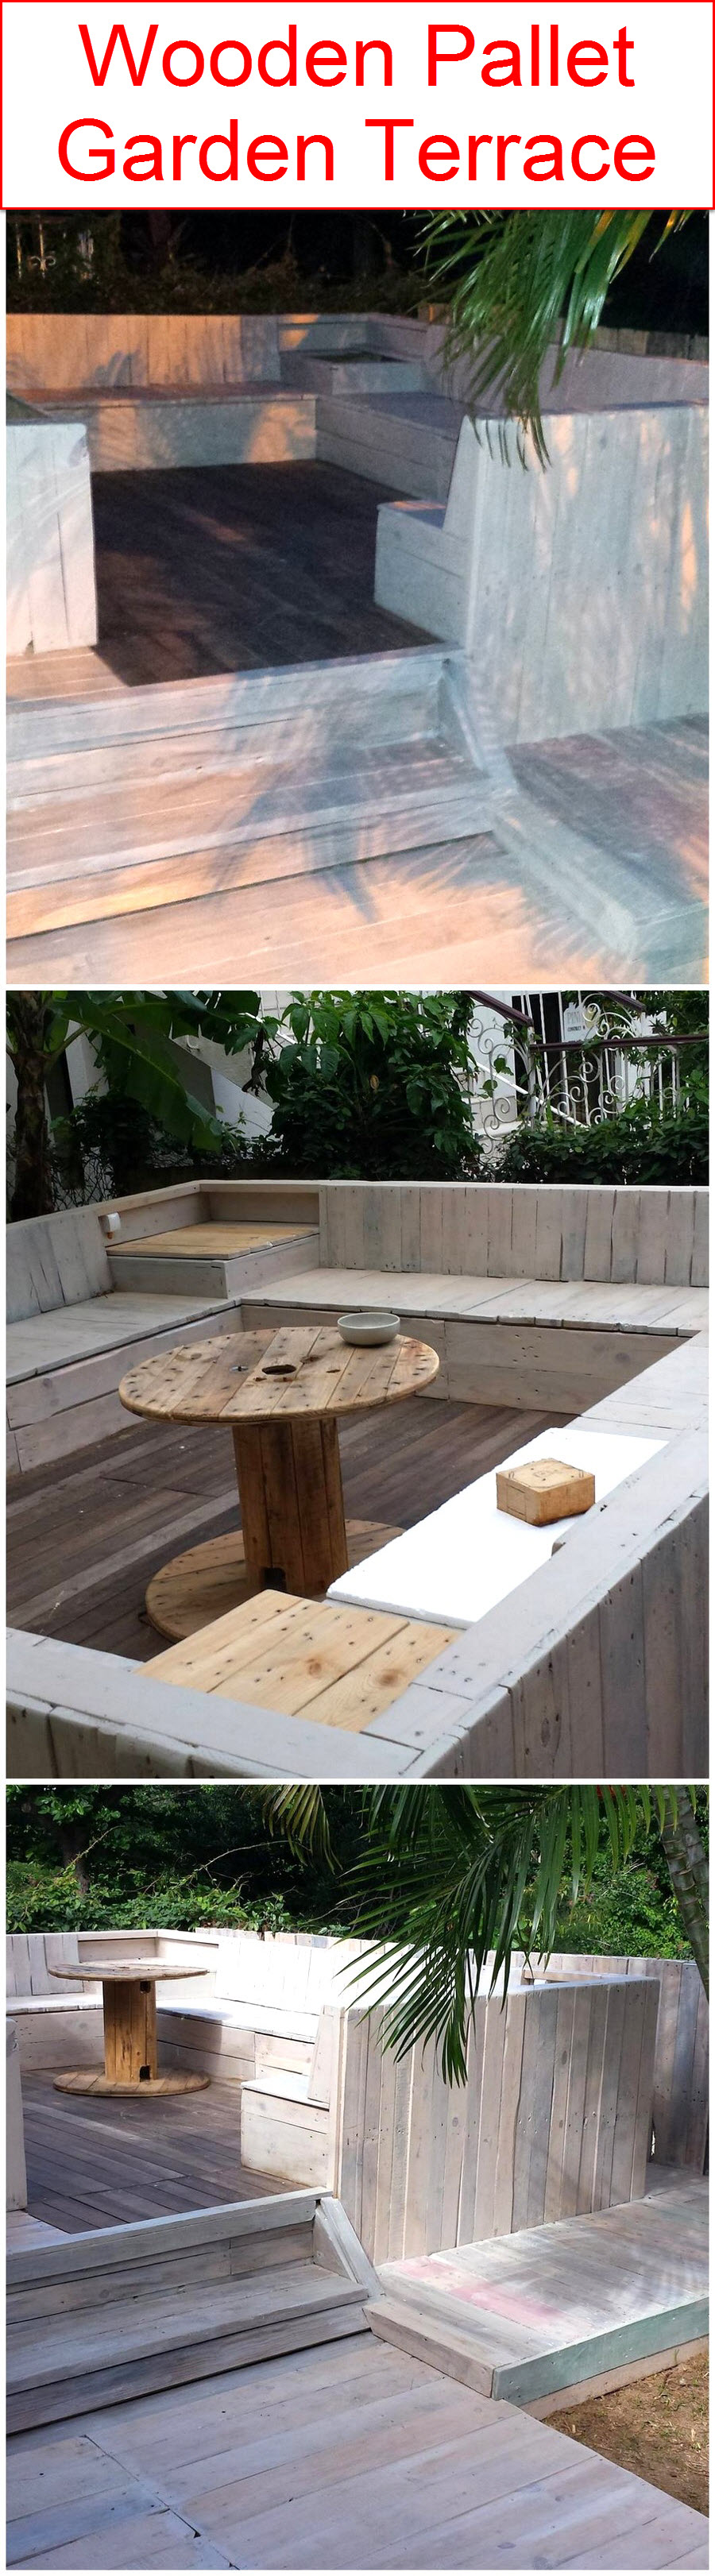 wooden-pallet-garden-terrace